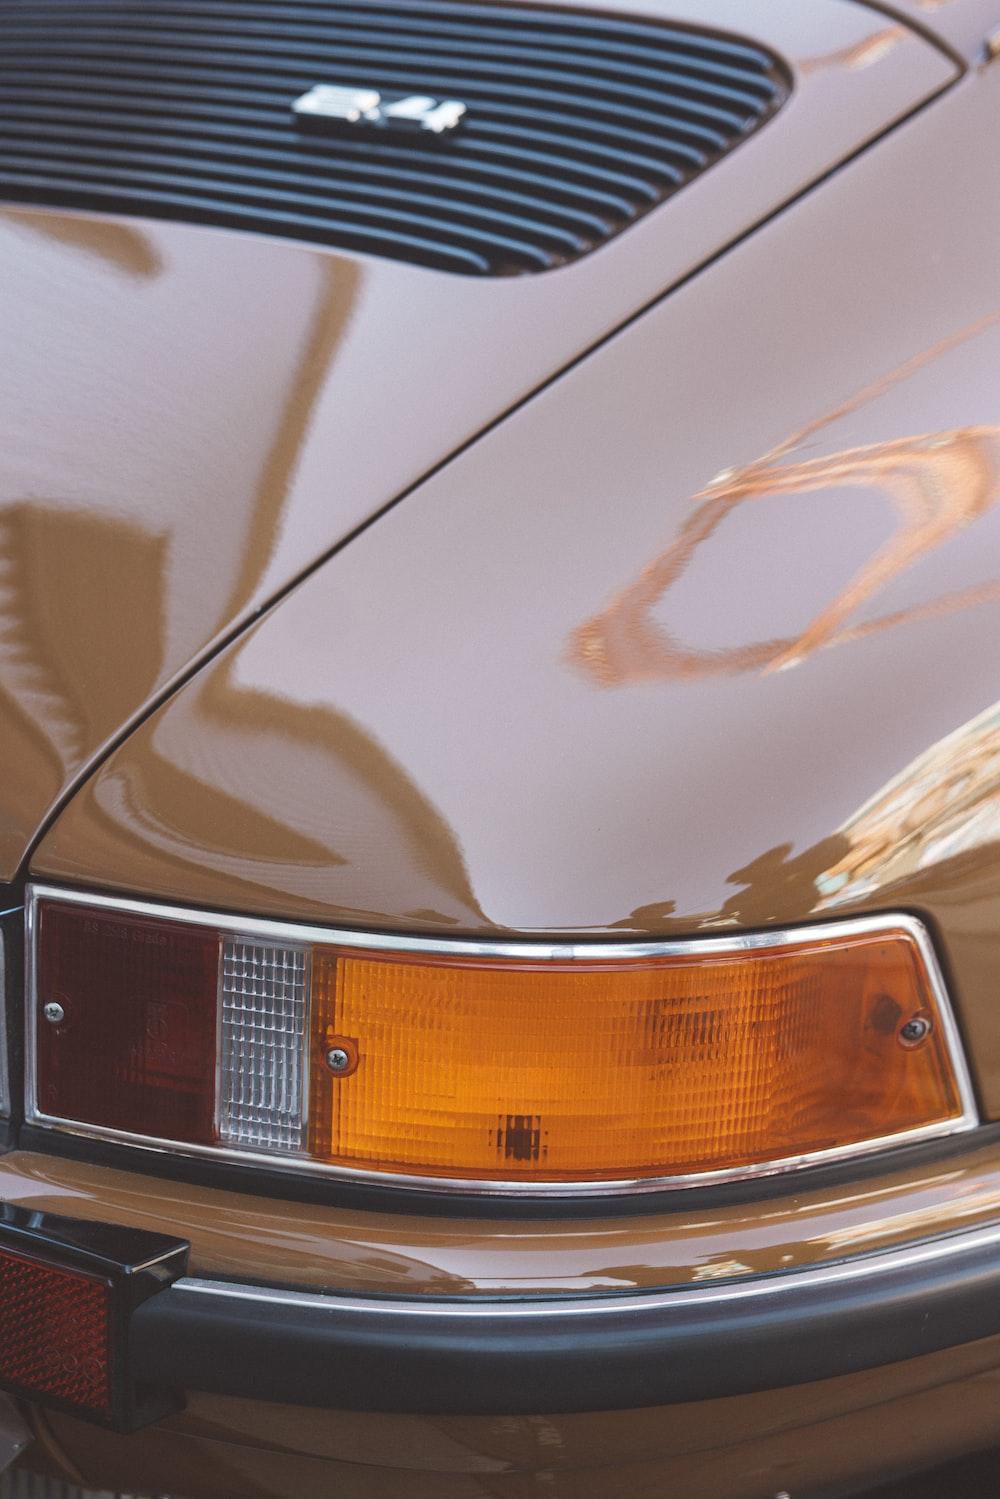 vehicle signal light